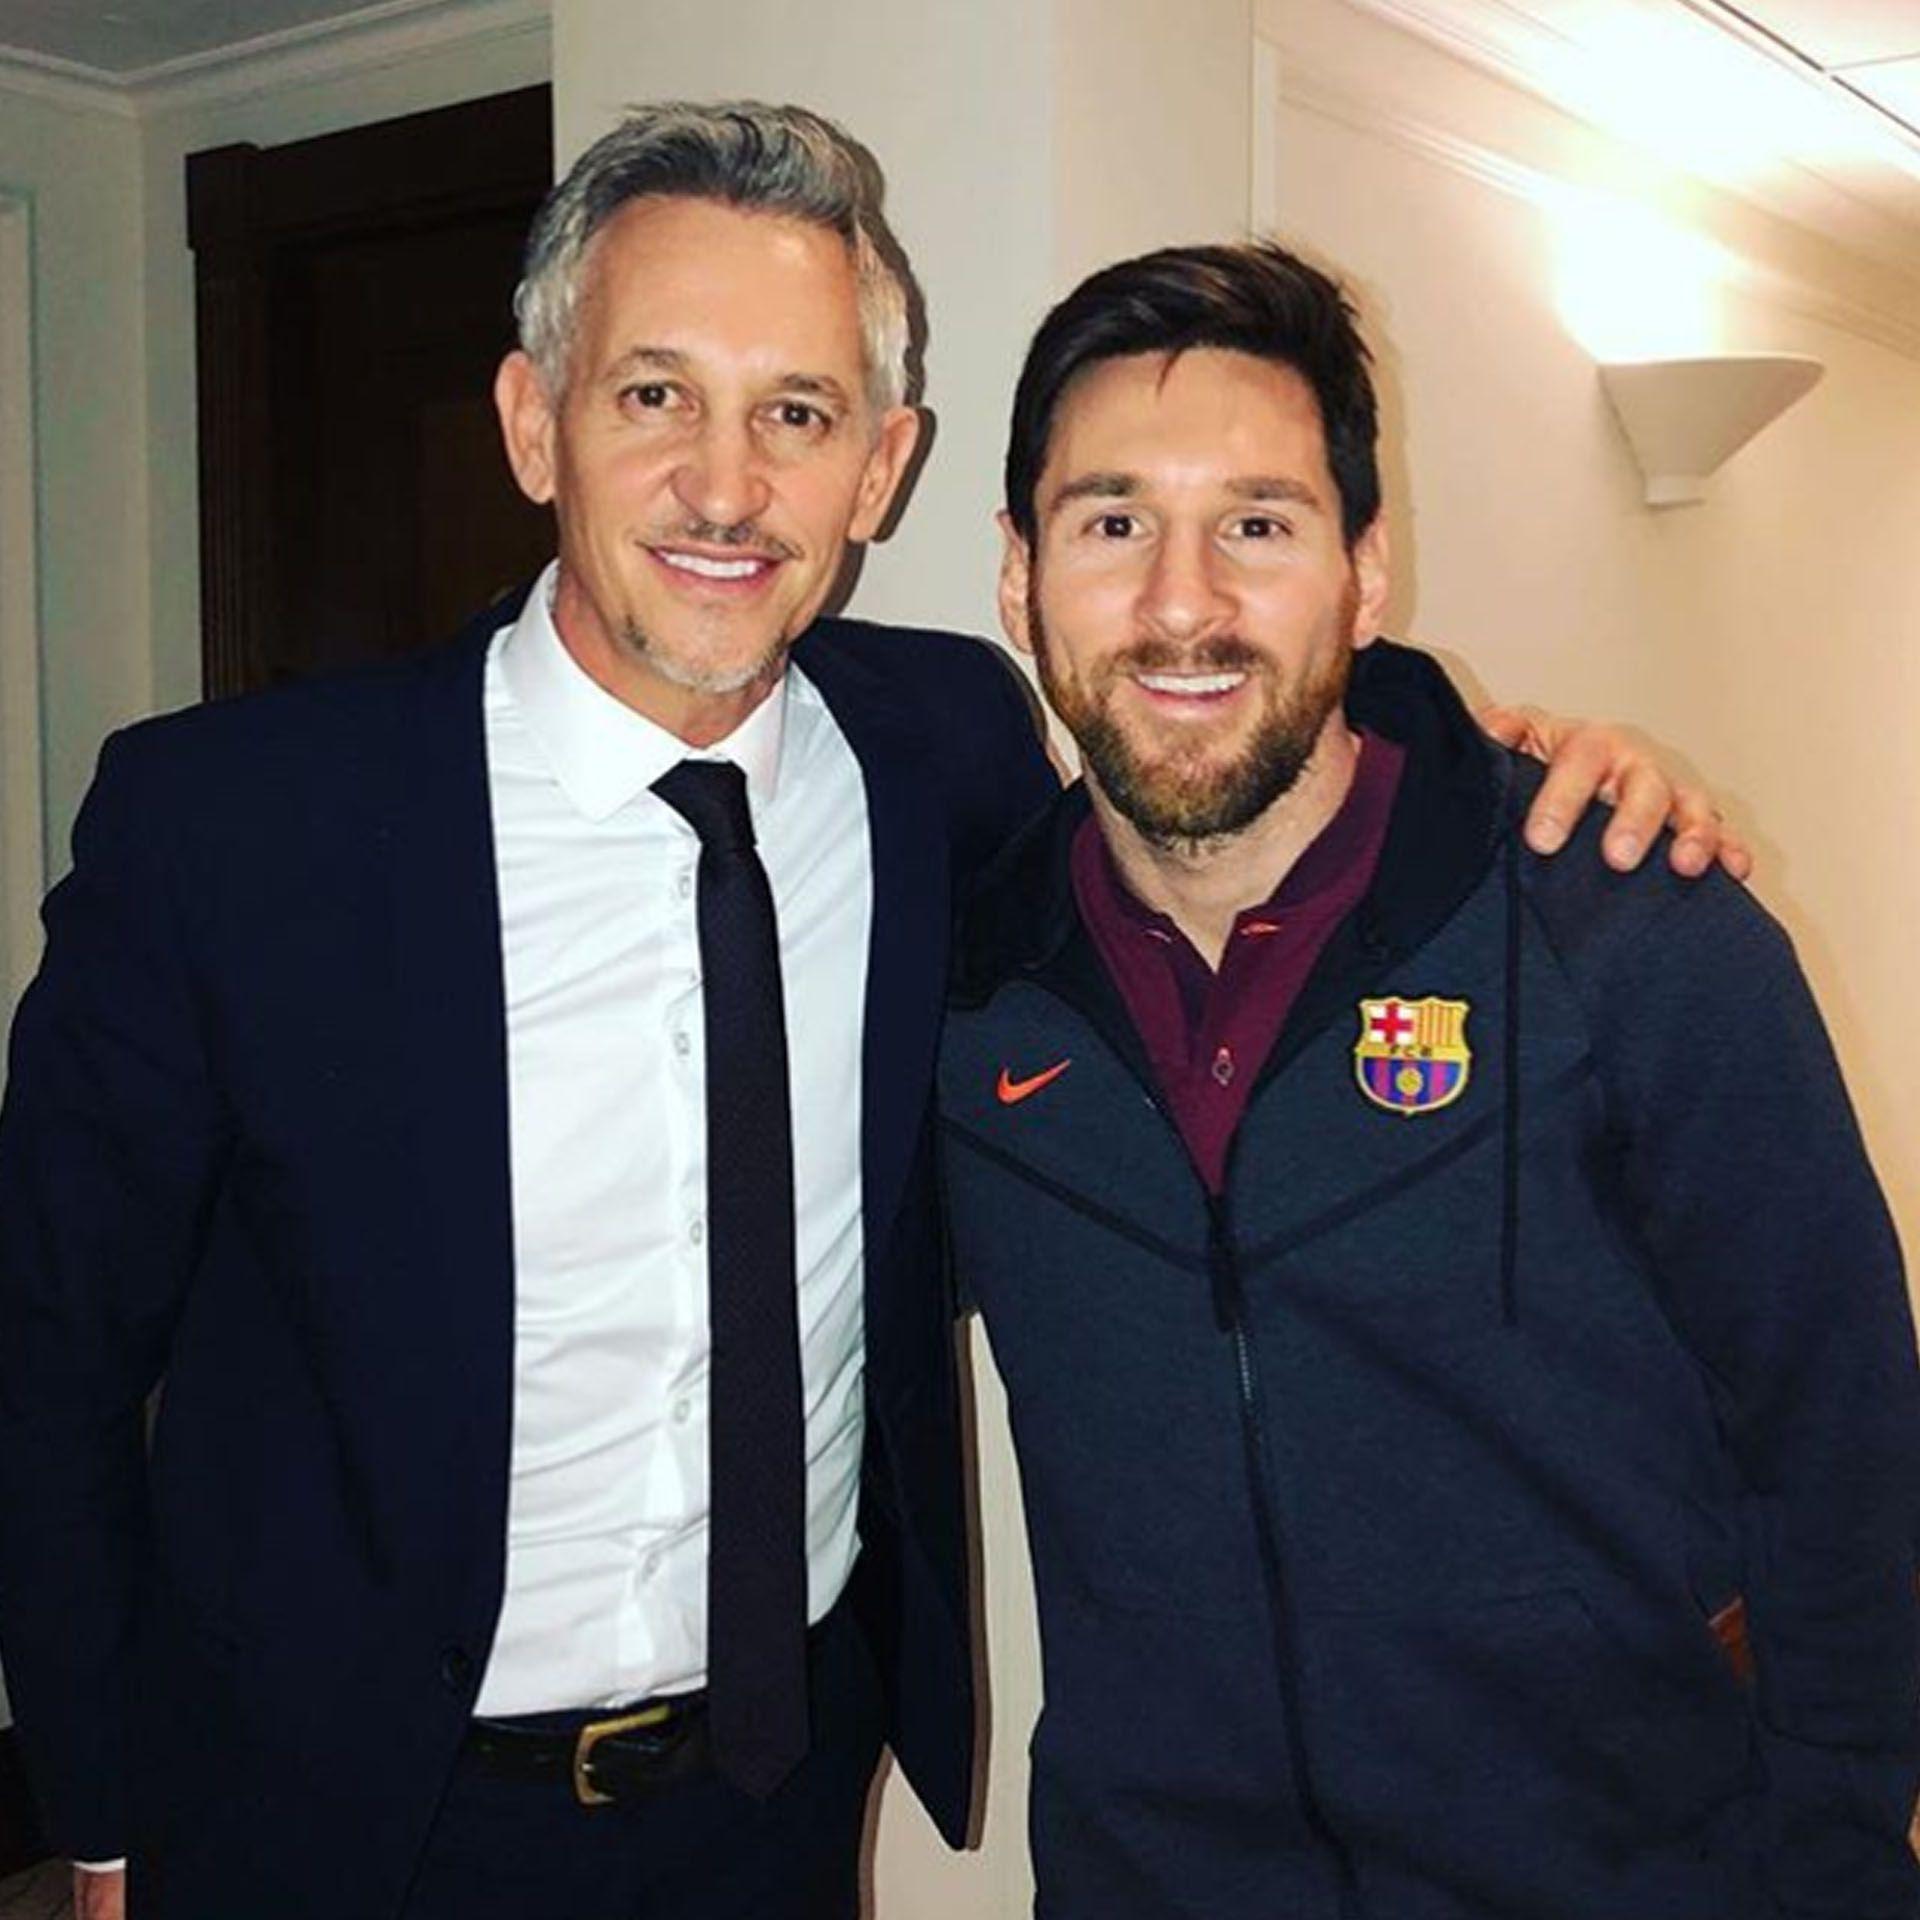 Gary Lineker y Lionel Messi (@garylineker)